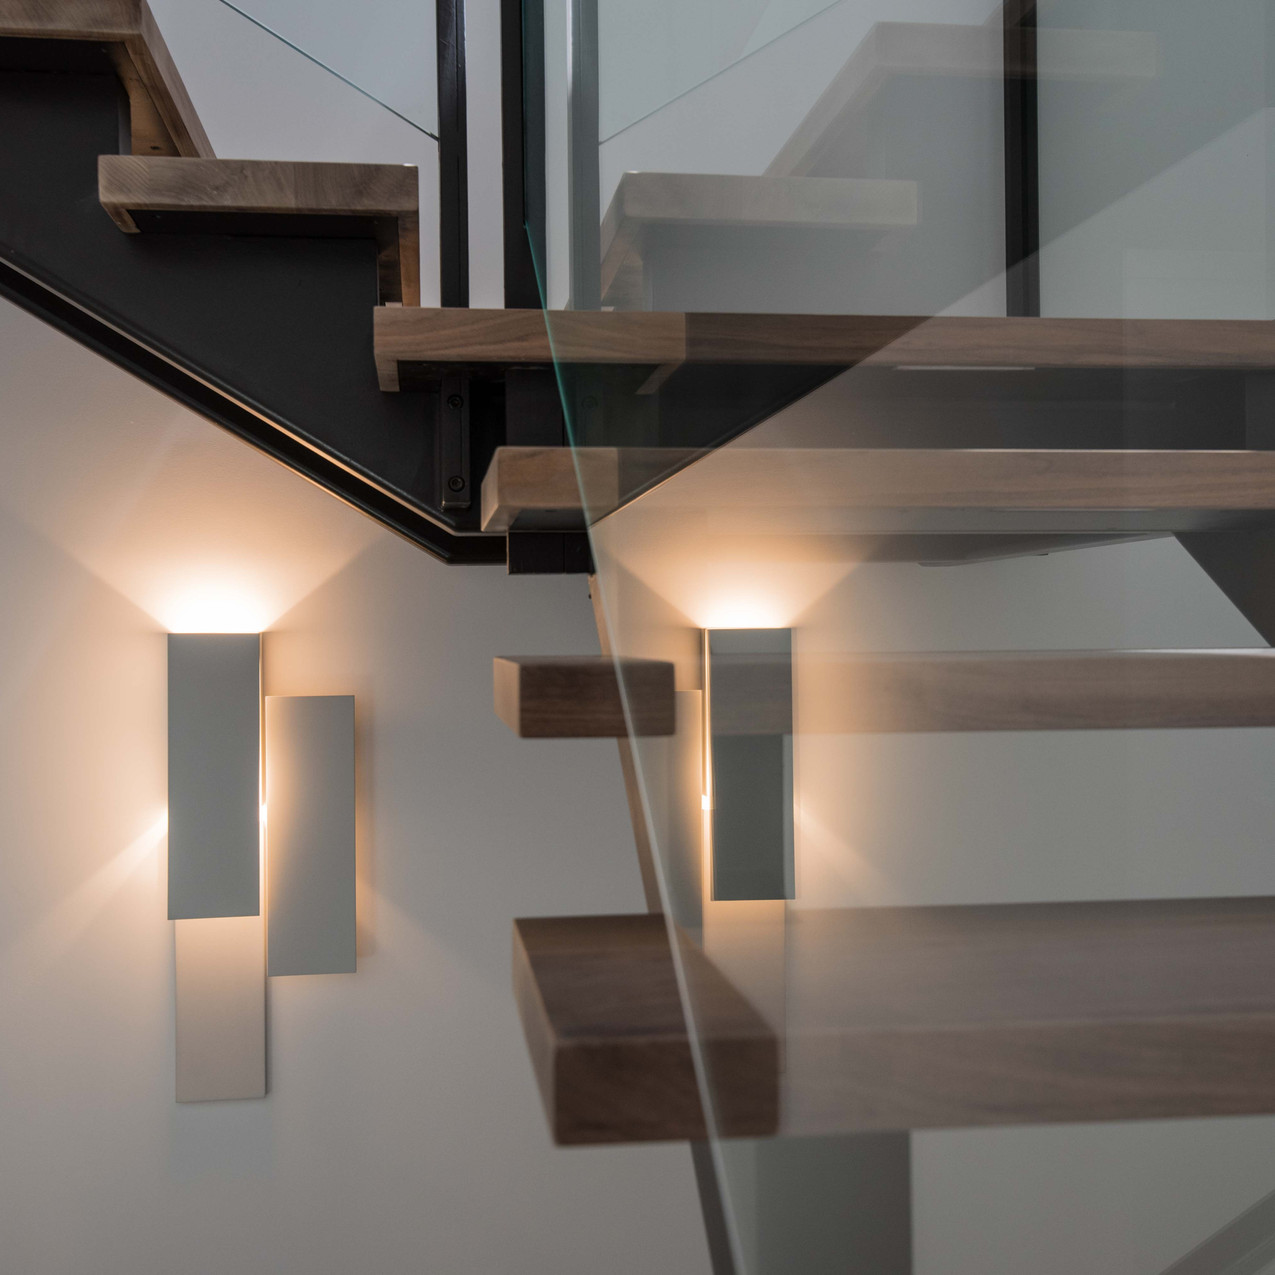 photographe architecture nice france french riviera paca cote dazur interieur-65